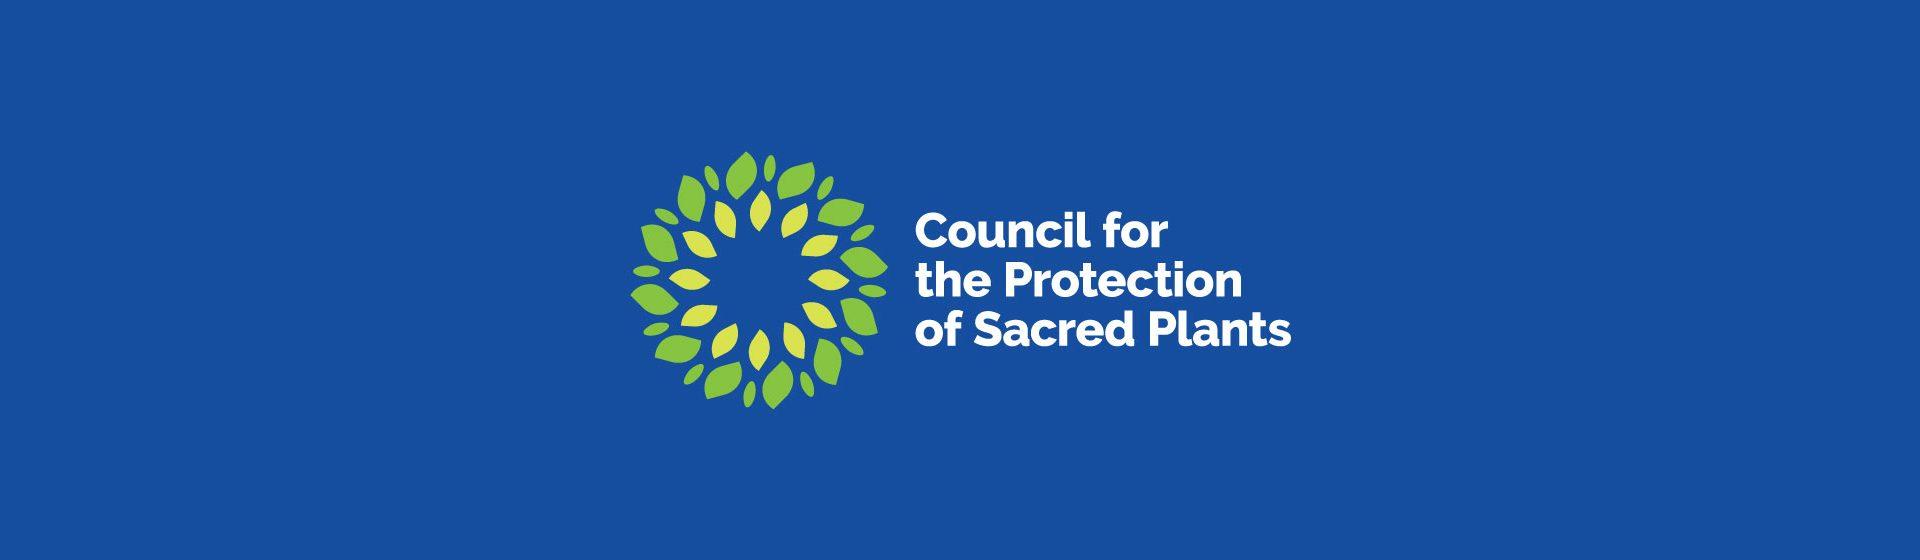 CPSP-logo-banner-final